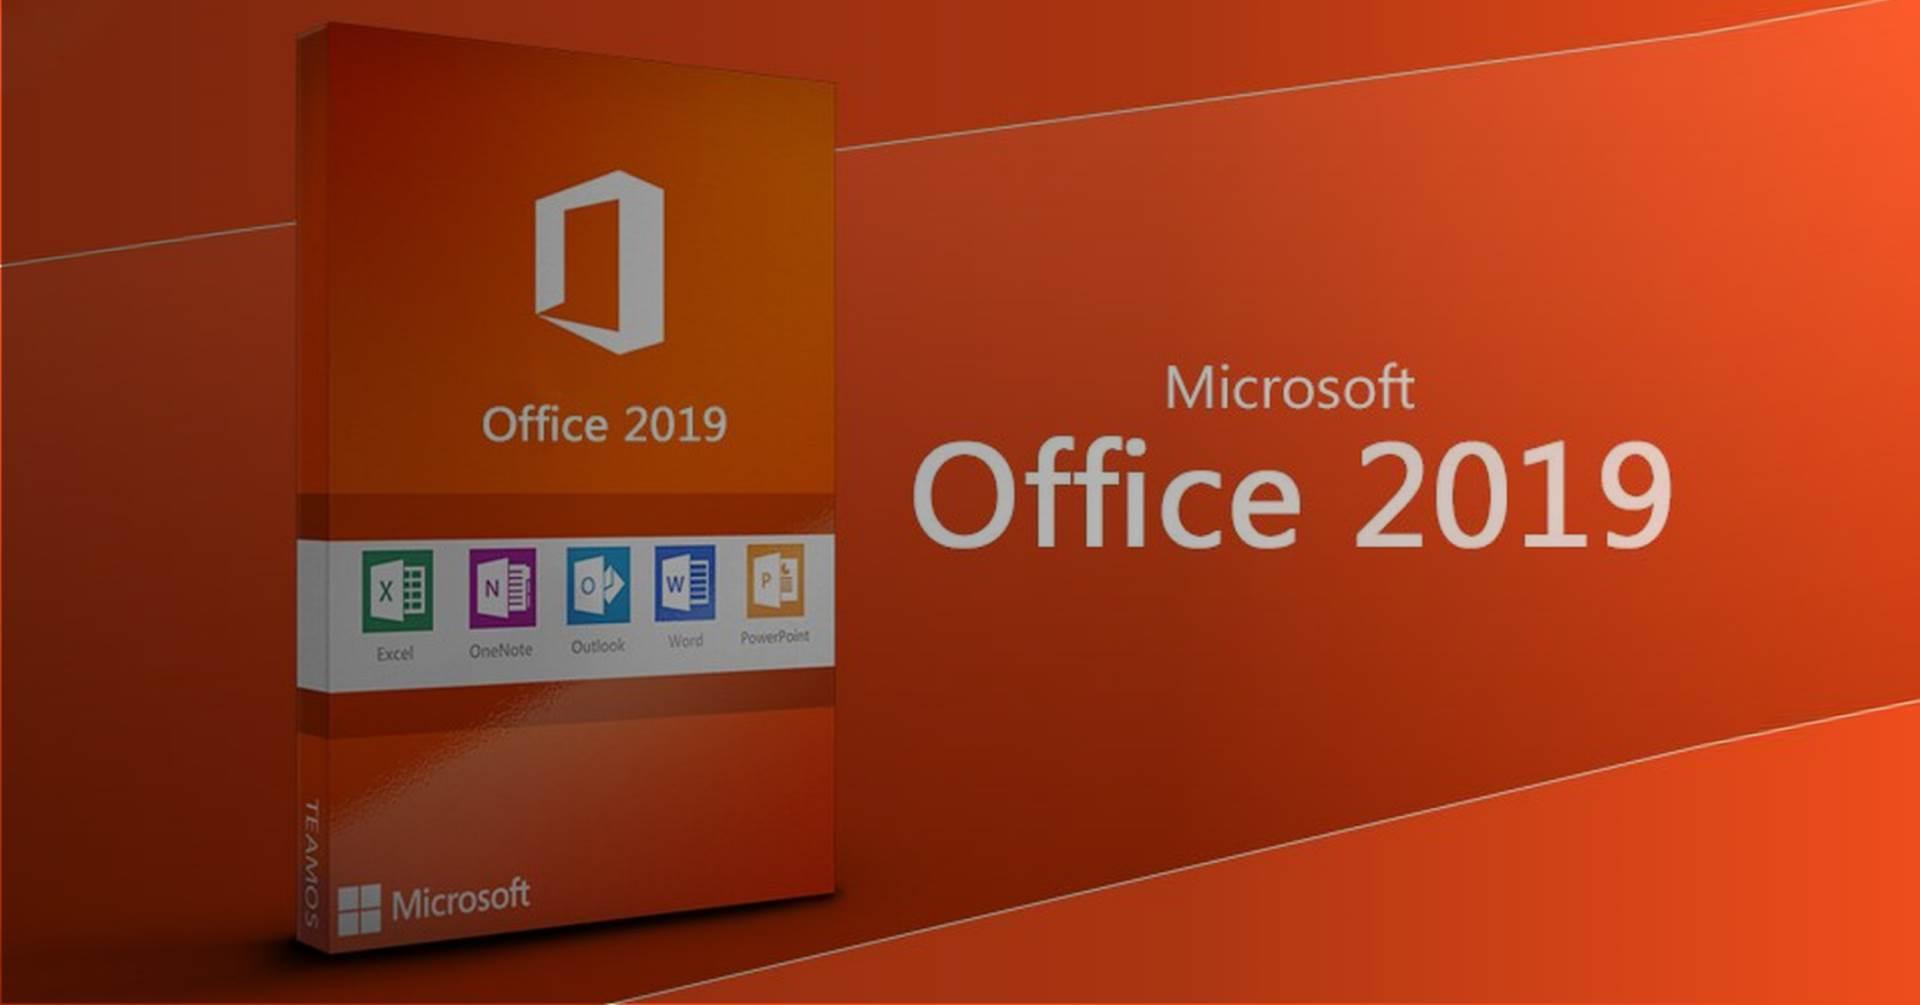 Microsoft-Office-2019-alati-mtel.jpg